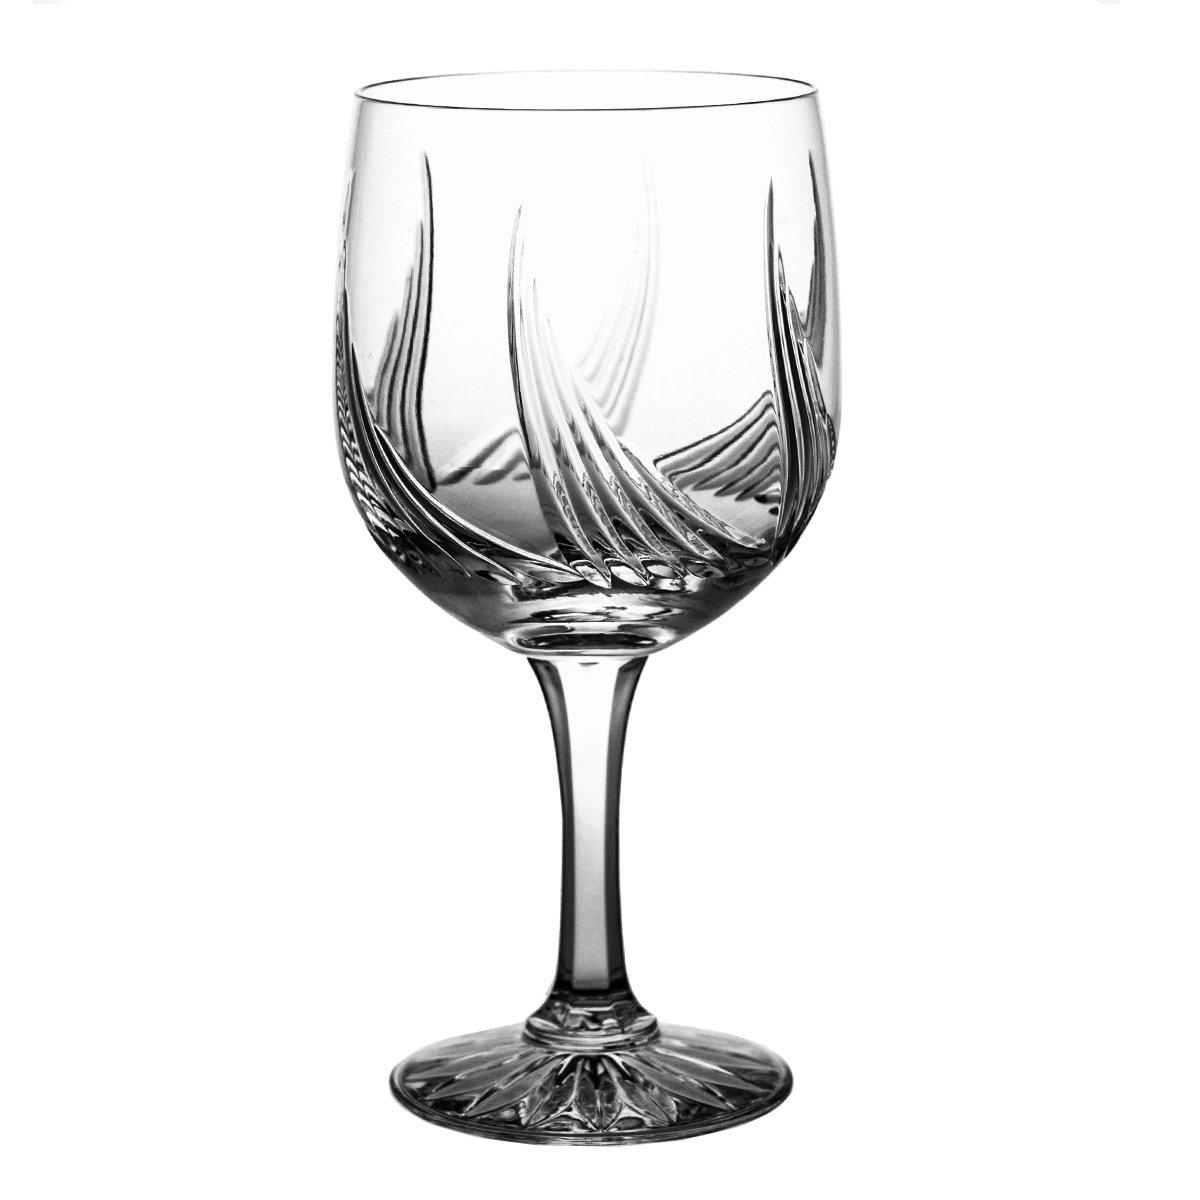 Pack of Aljulia 6642Water Glass Lead Crystal Carved-Retail Packaging-Alium Line, Set of 6, 500ml by Crystal Julia